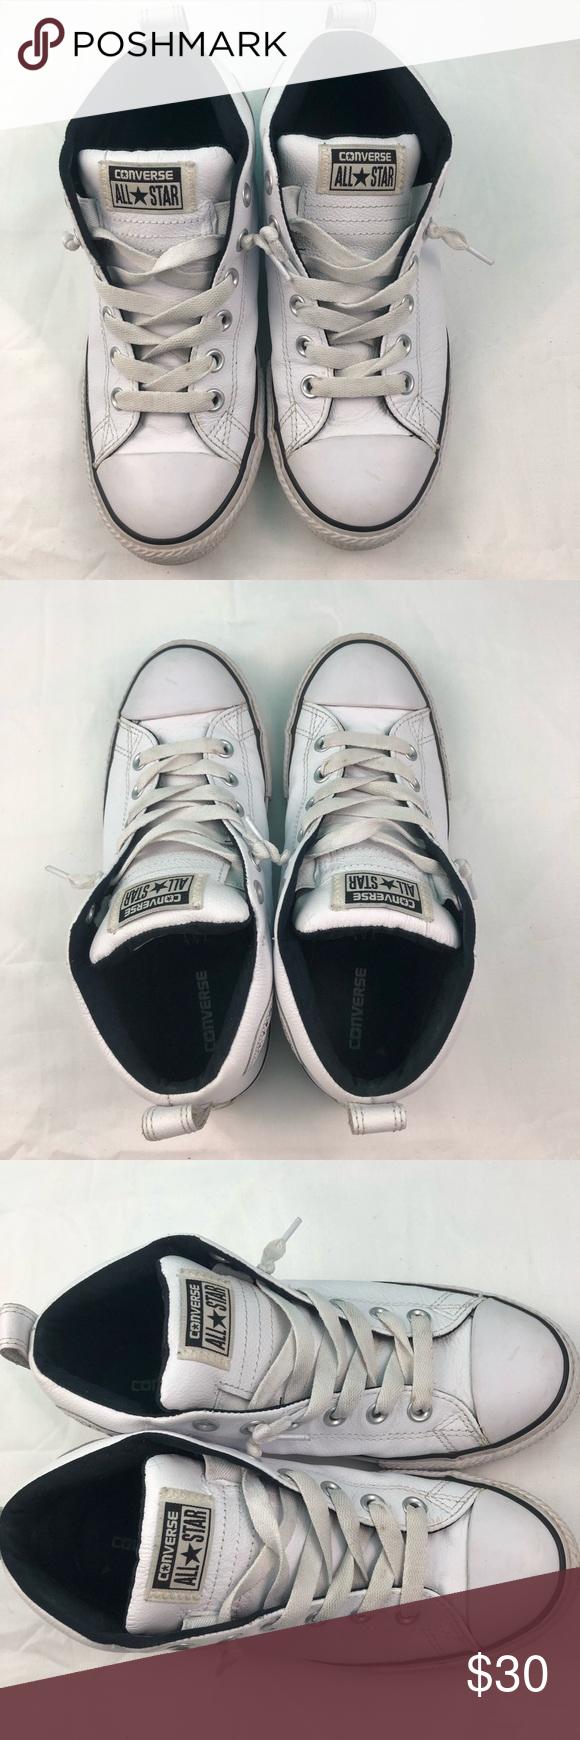 Converse Junior Size 5 White High Tops